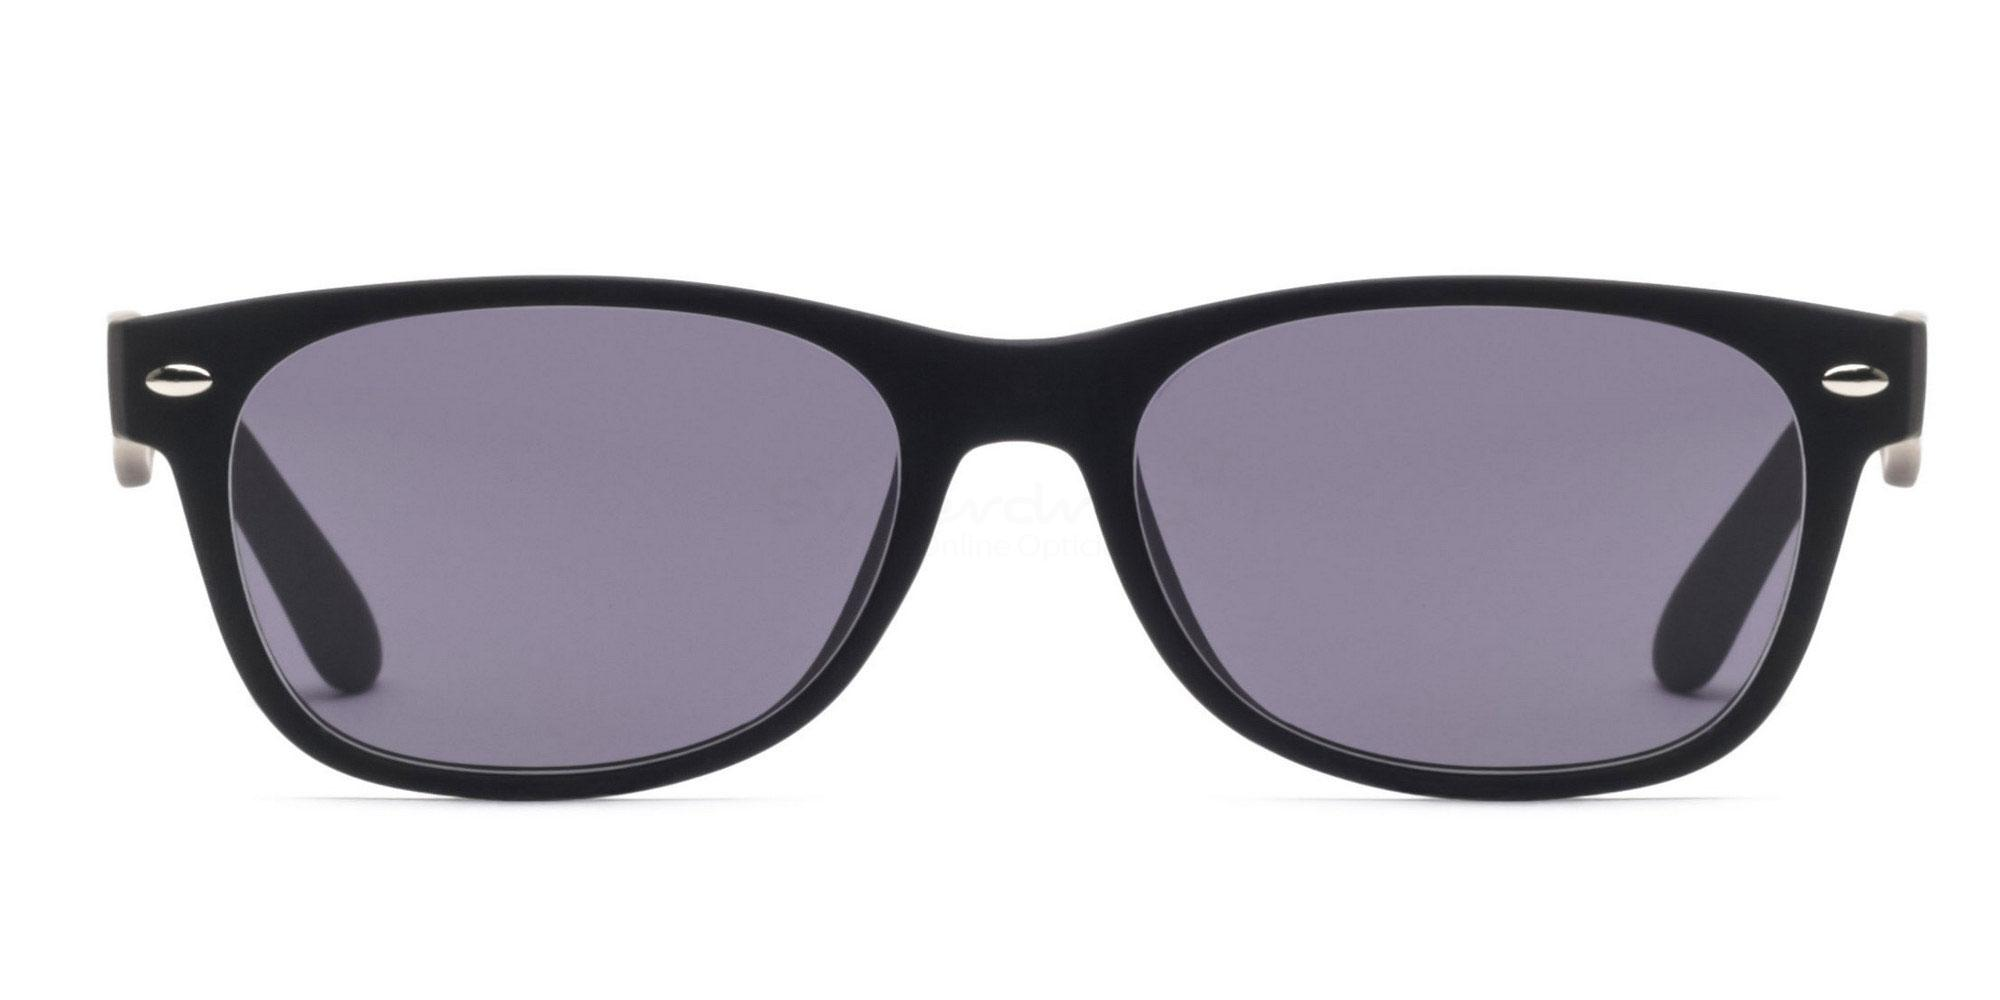 Black S8122 - Black (Sunglasses) Sunglasses, Helium